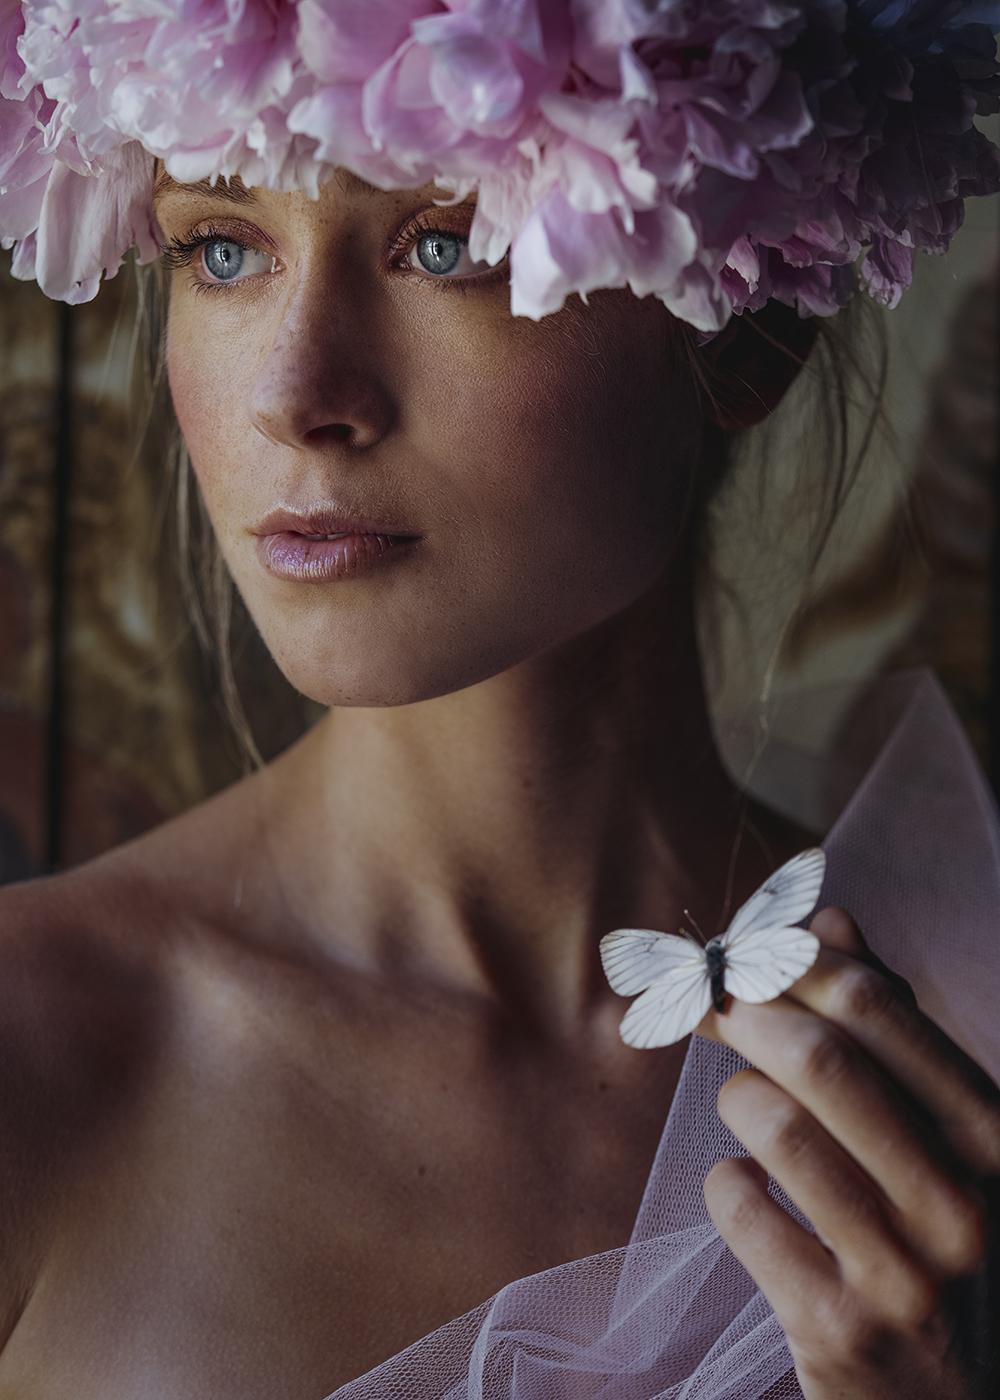 Photography by Aiala Hernando